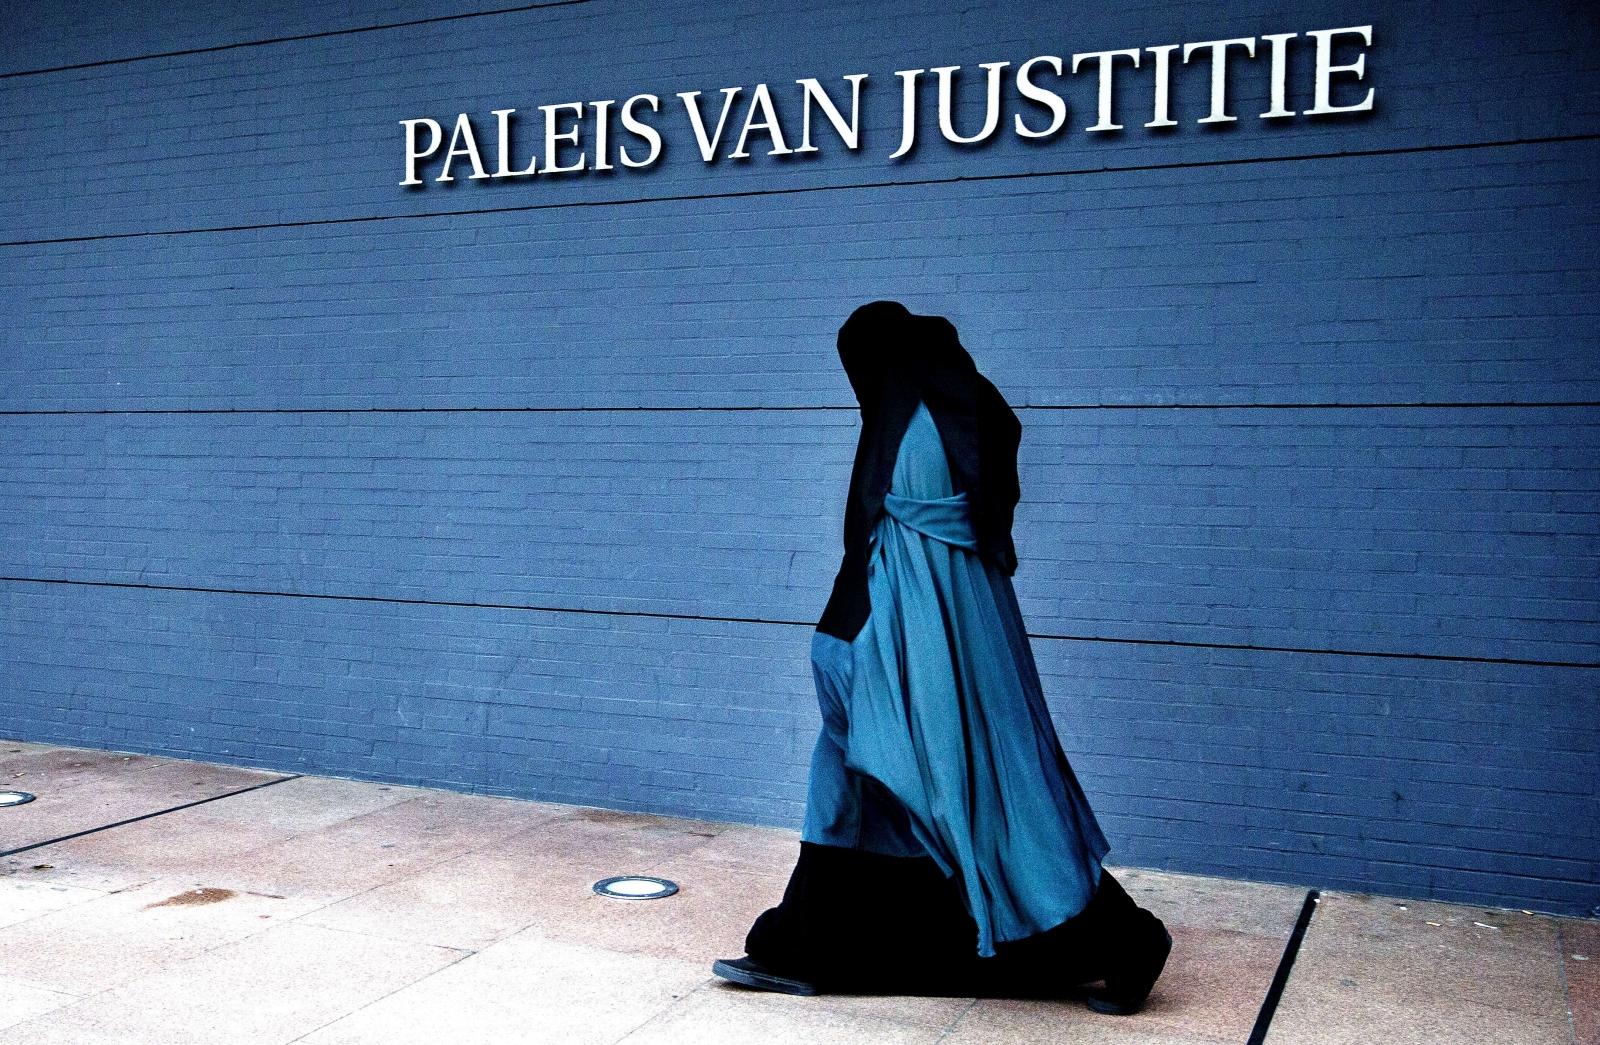 muslim woman burqa The Hague